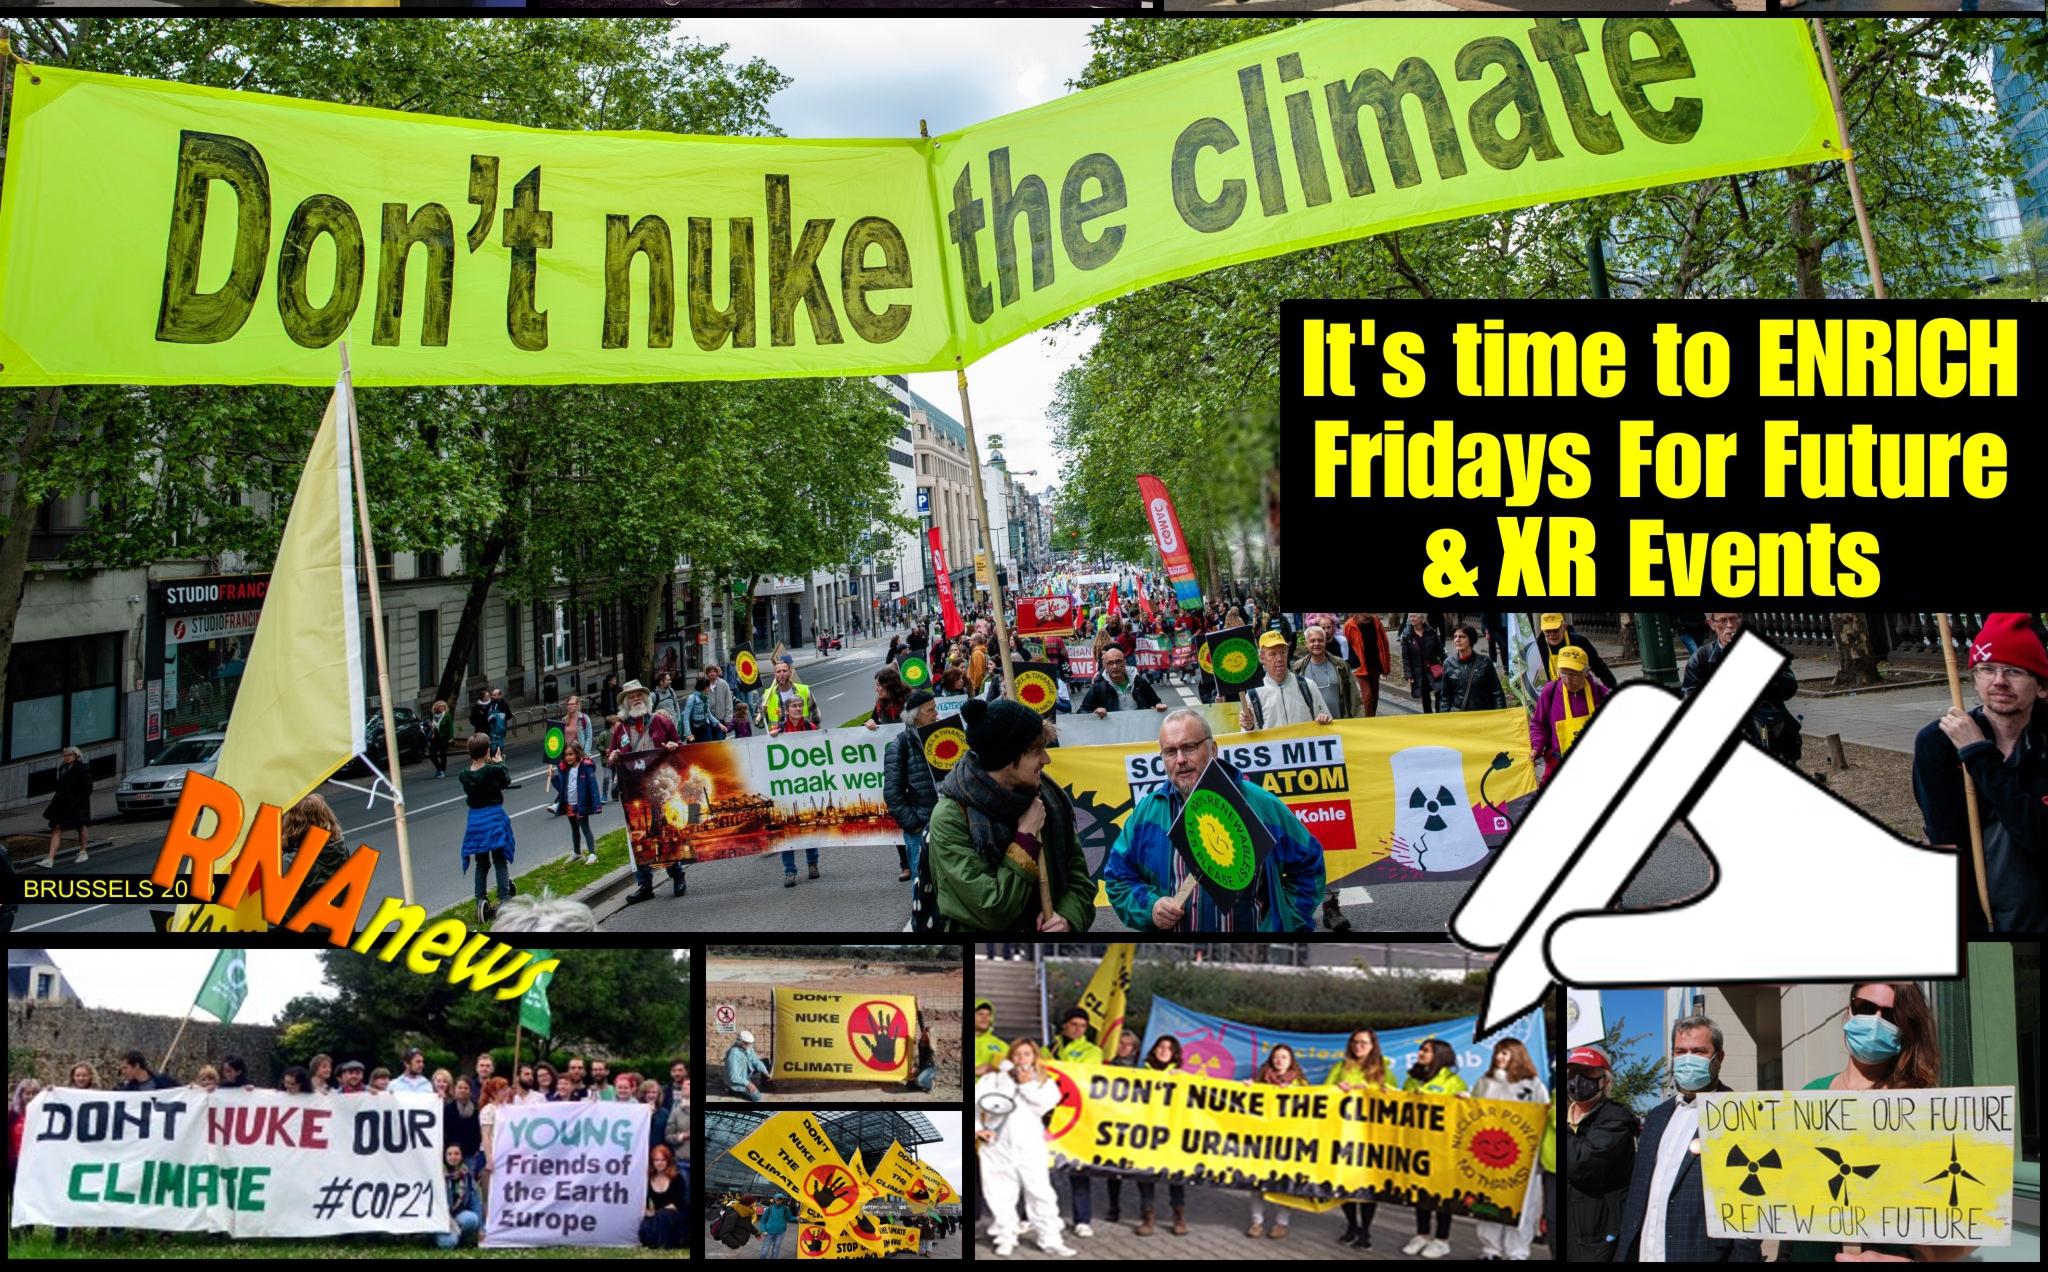 PLEASE SAY SOMETHING ABOUT NUCLEAR! - Appello internazionale di RNA ai leaders di Extinction Rebellion e Fridays For Future